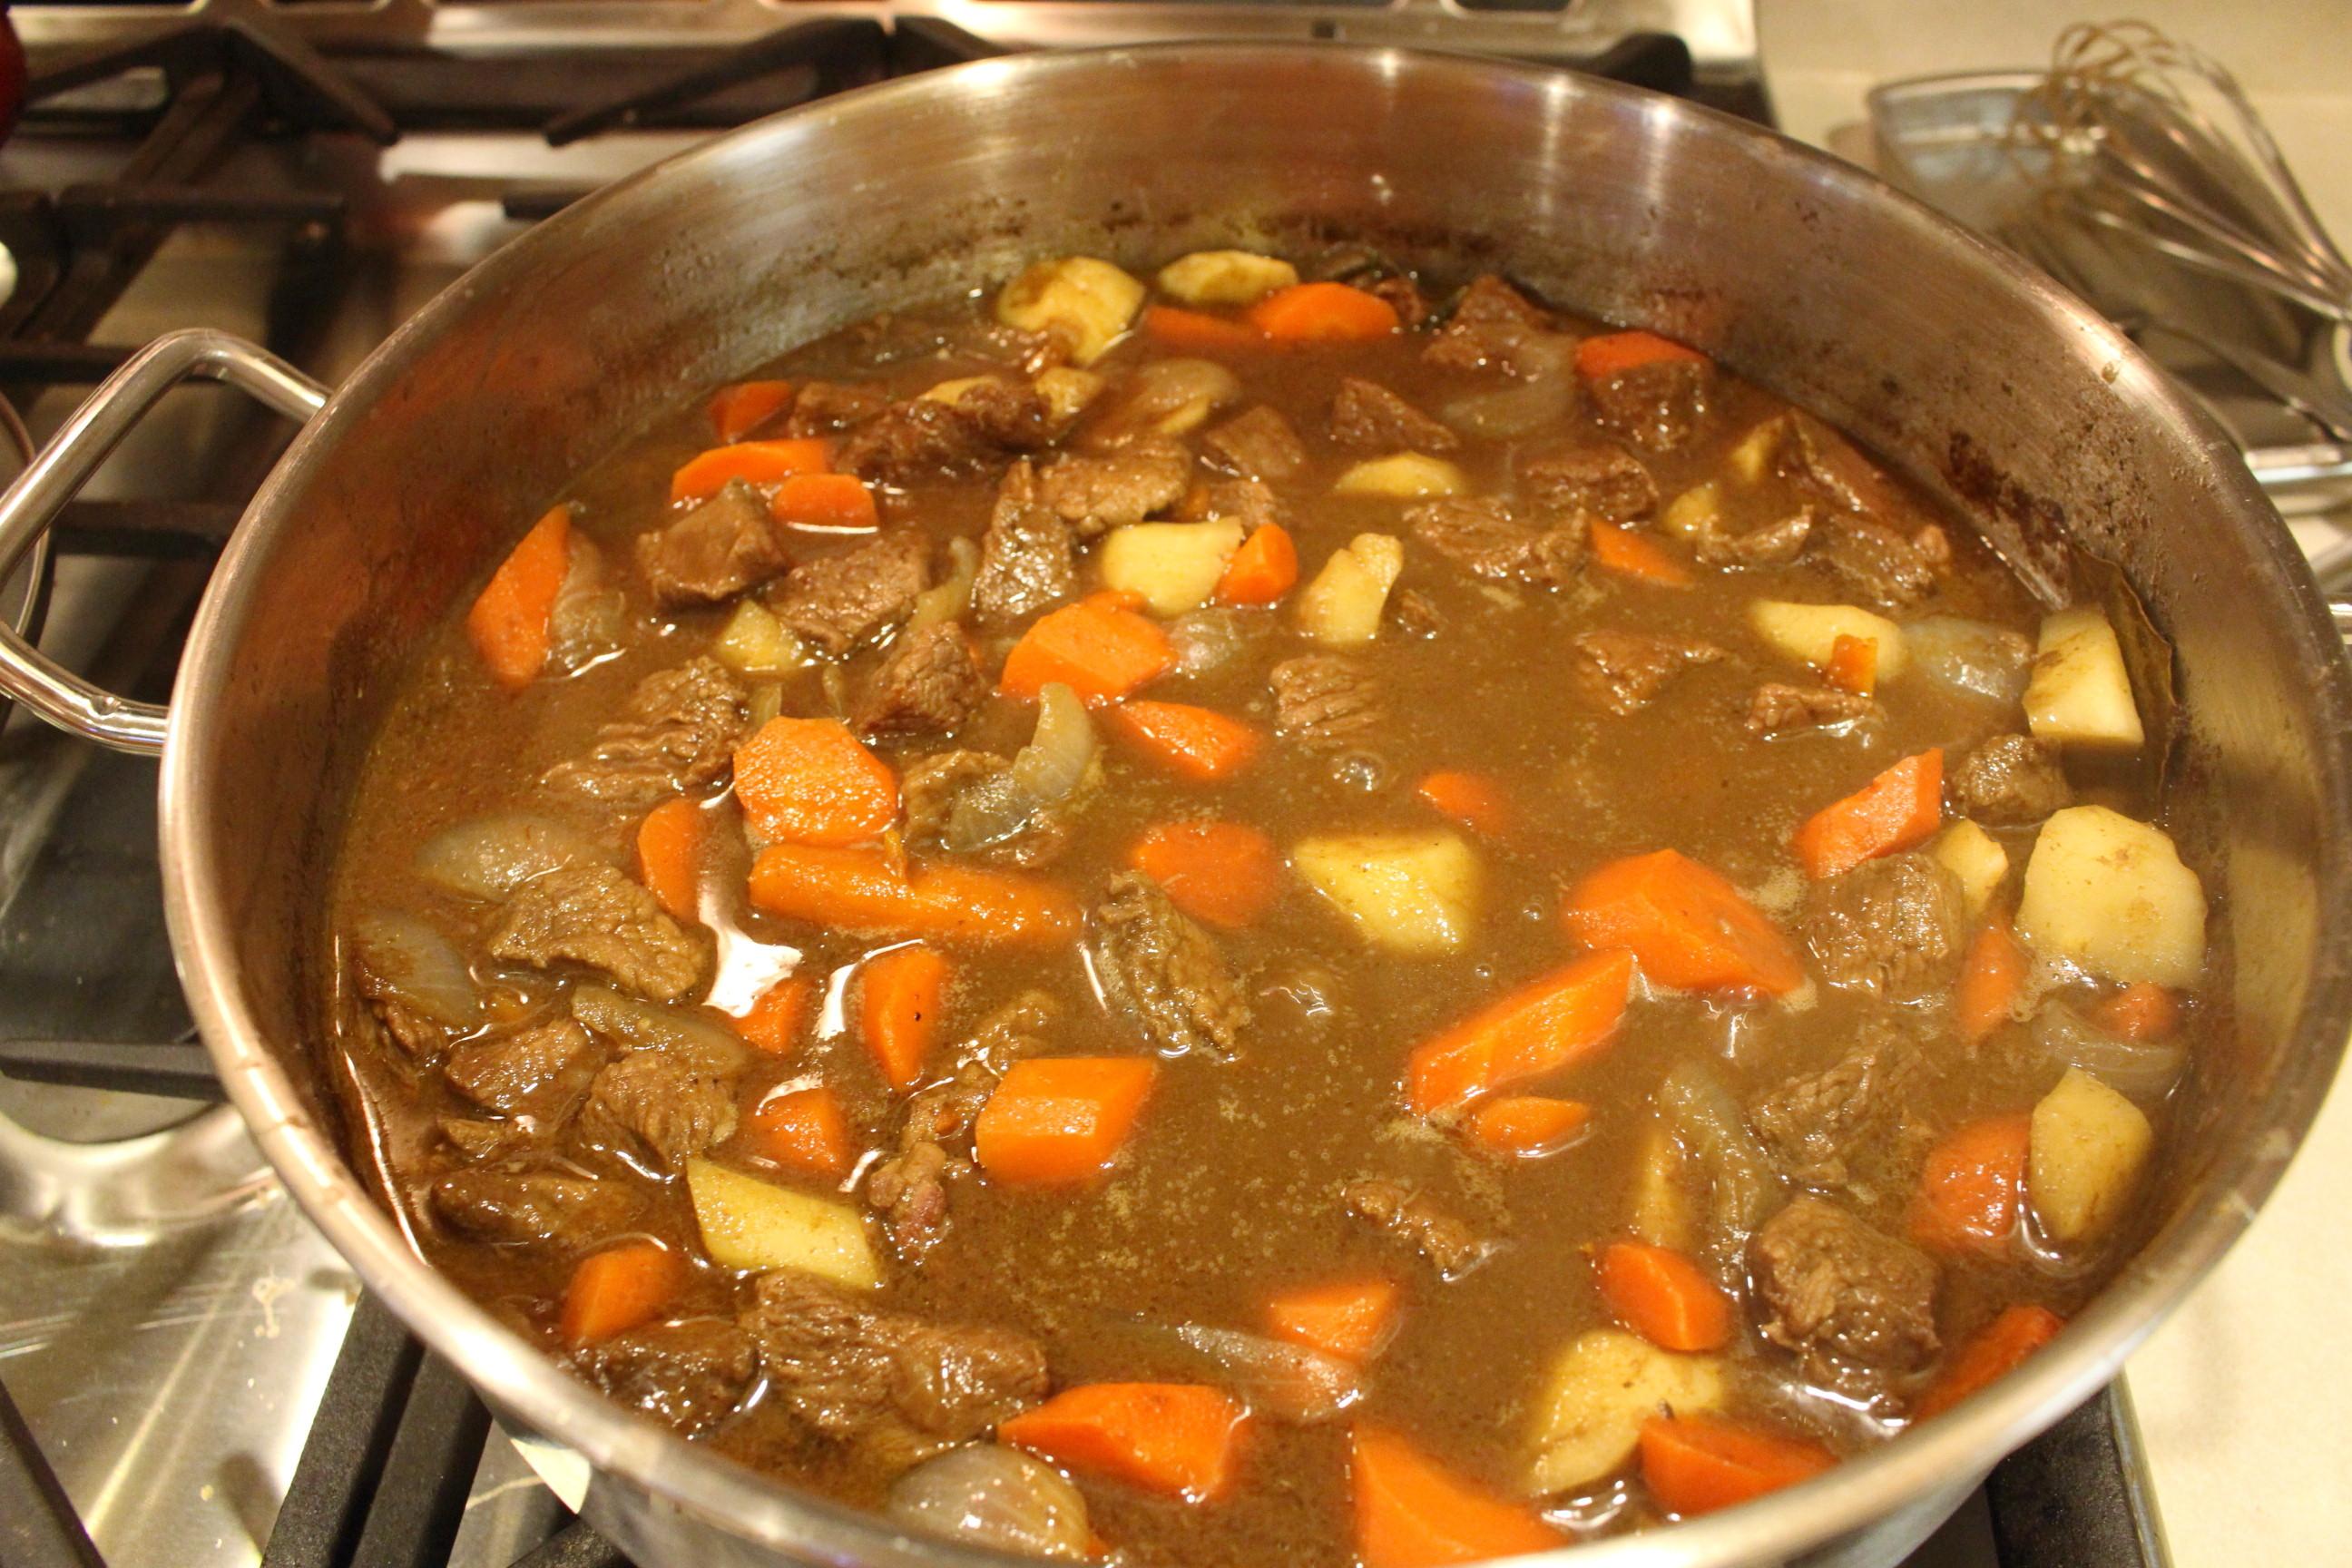 Beef Stew Stove Top  stove top beef stew